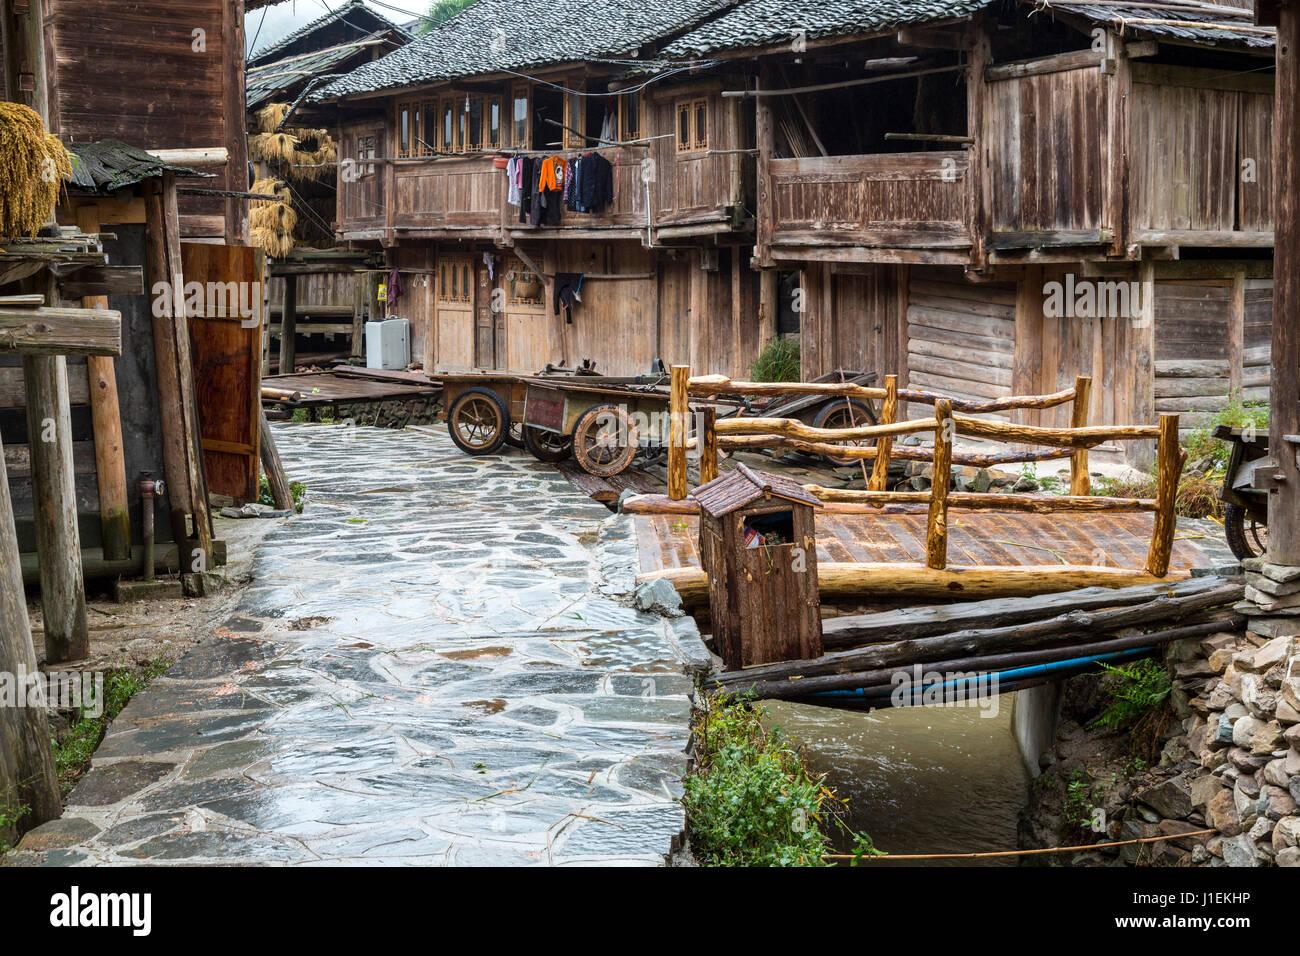 Case Tradizionali Cinesi : Huanggang guizhou cina. case tradizionali in un dong villaggio